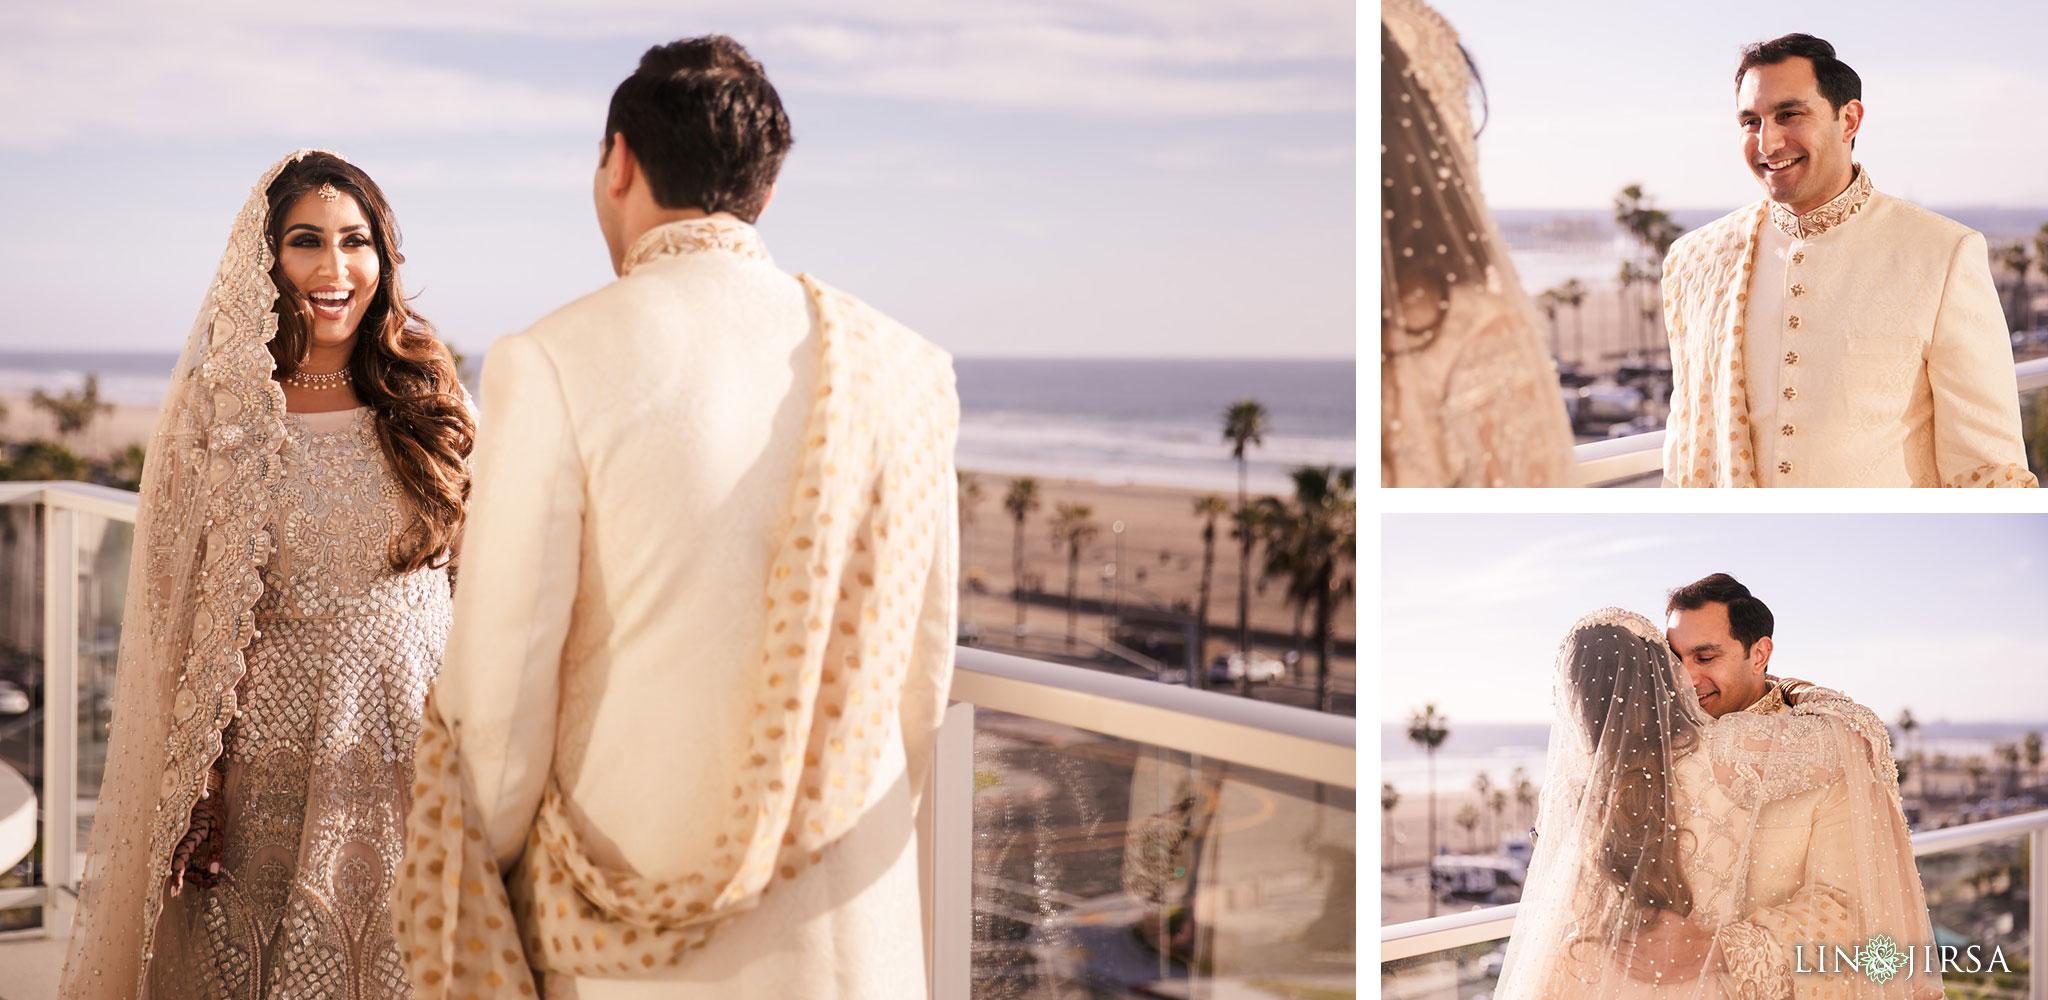 12 pasea hotel spa huntington beach pakistani muslim wedding photography